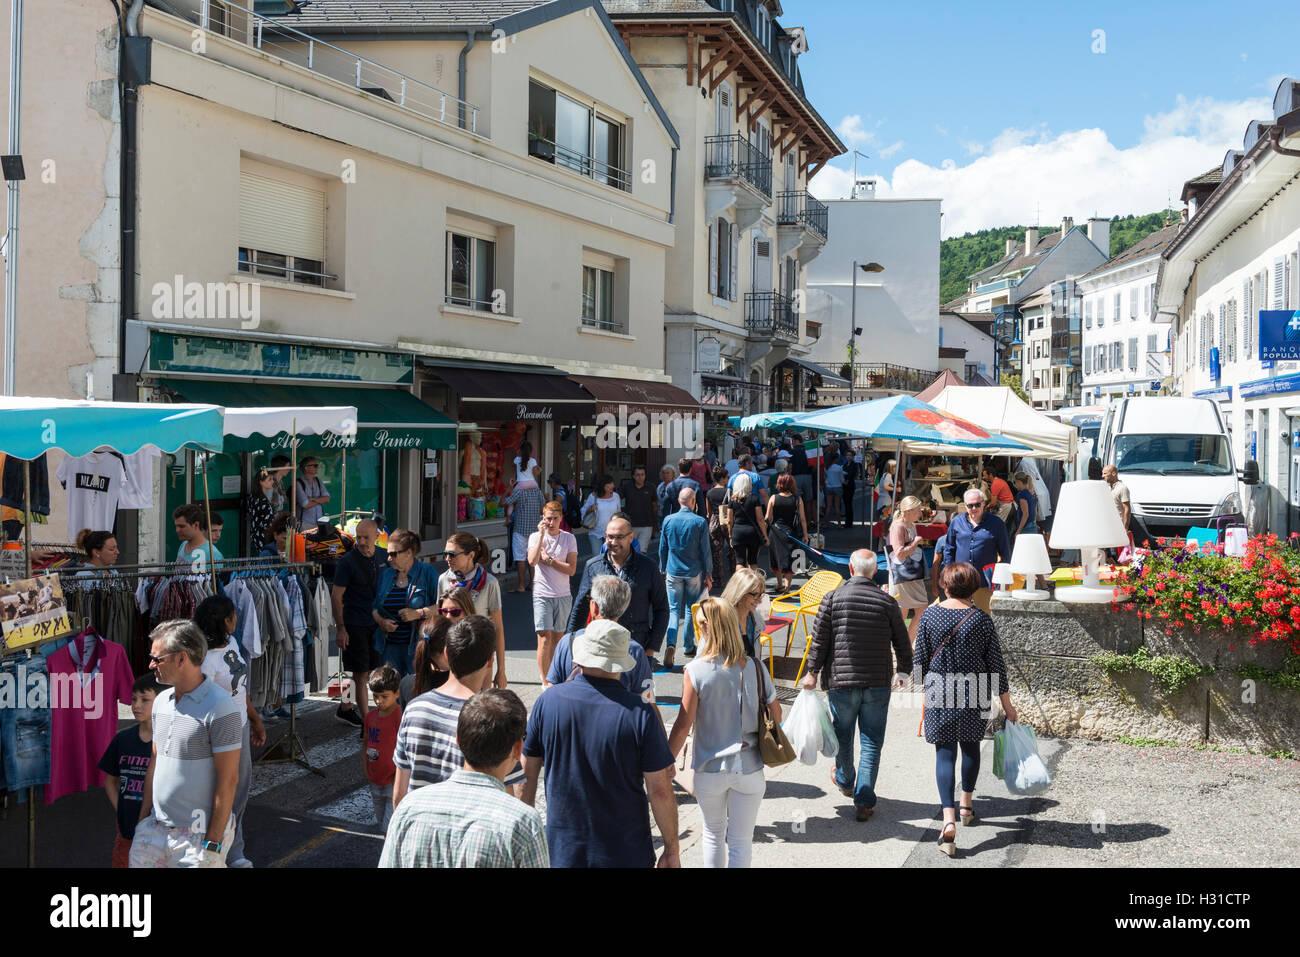 Busy street market in Divonne-les-Bains, Auvergne-Rhône-Alpes, France - Stock Image